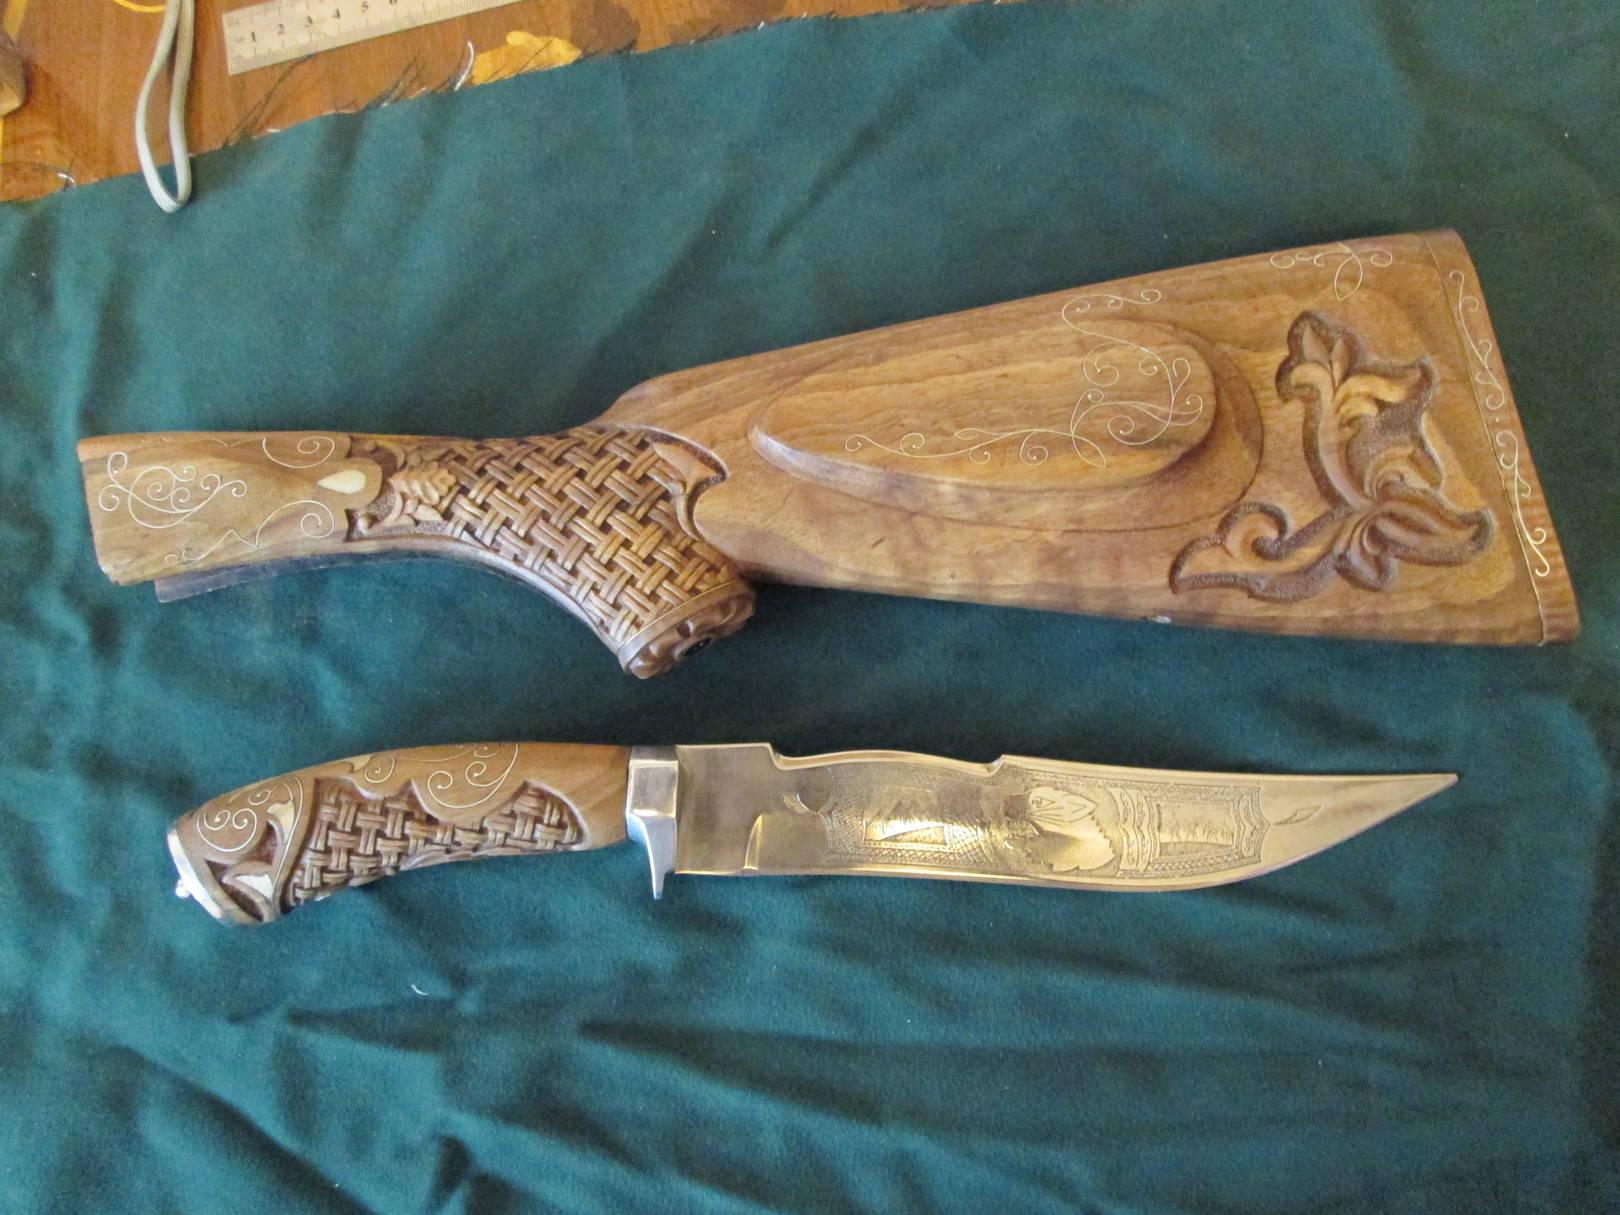 Приклад,Нож. Орех,Самшит,Серебро. Сталь.